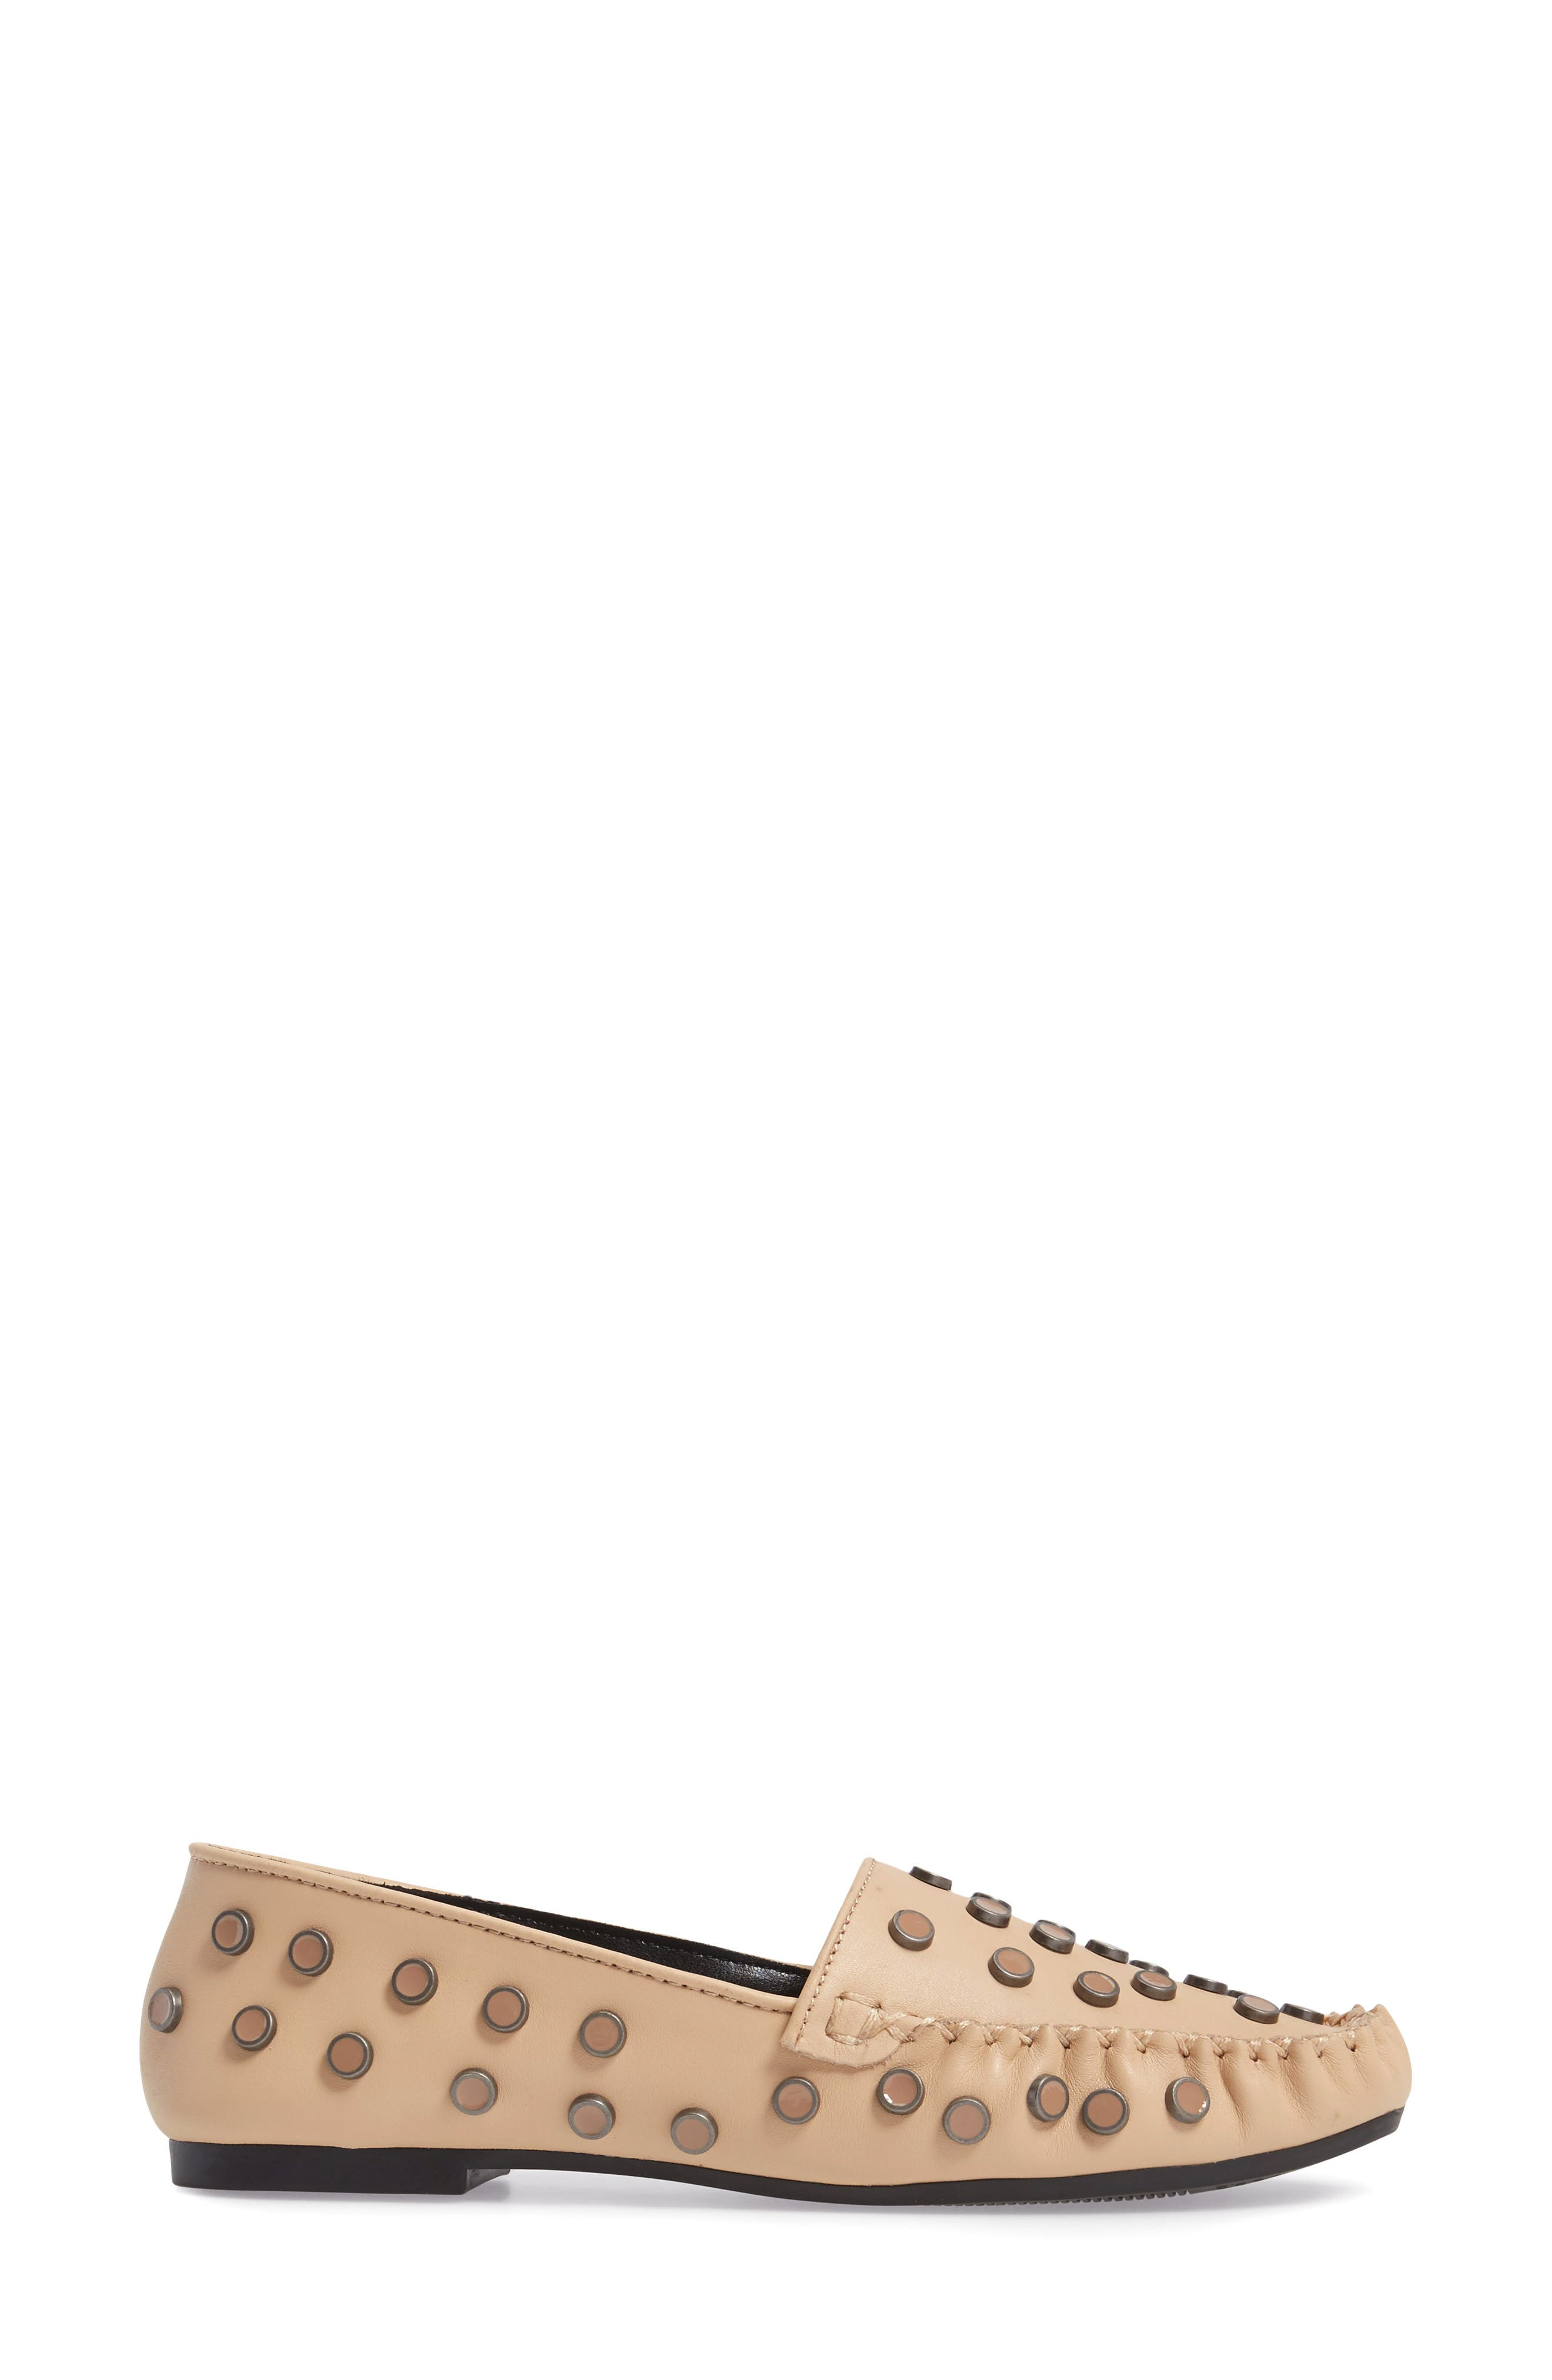 M4D3 Conneticut Loafer,                             Alternate thumbnail 3, color,                             Bisque Leather